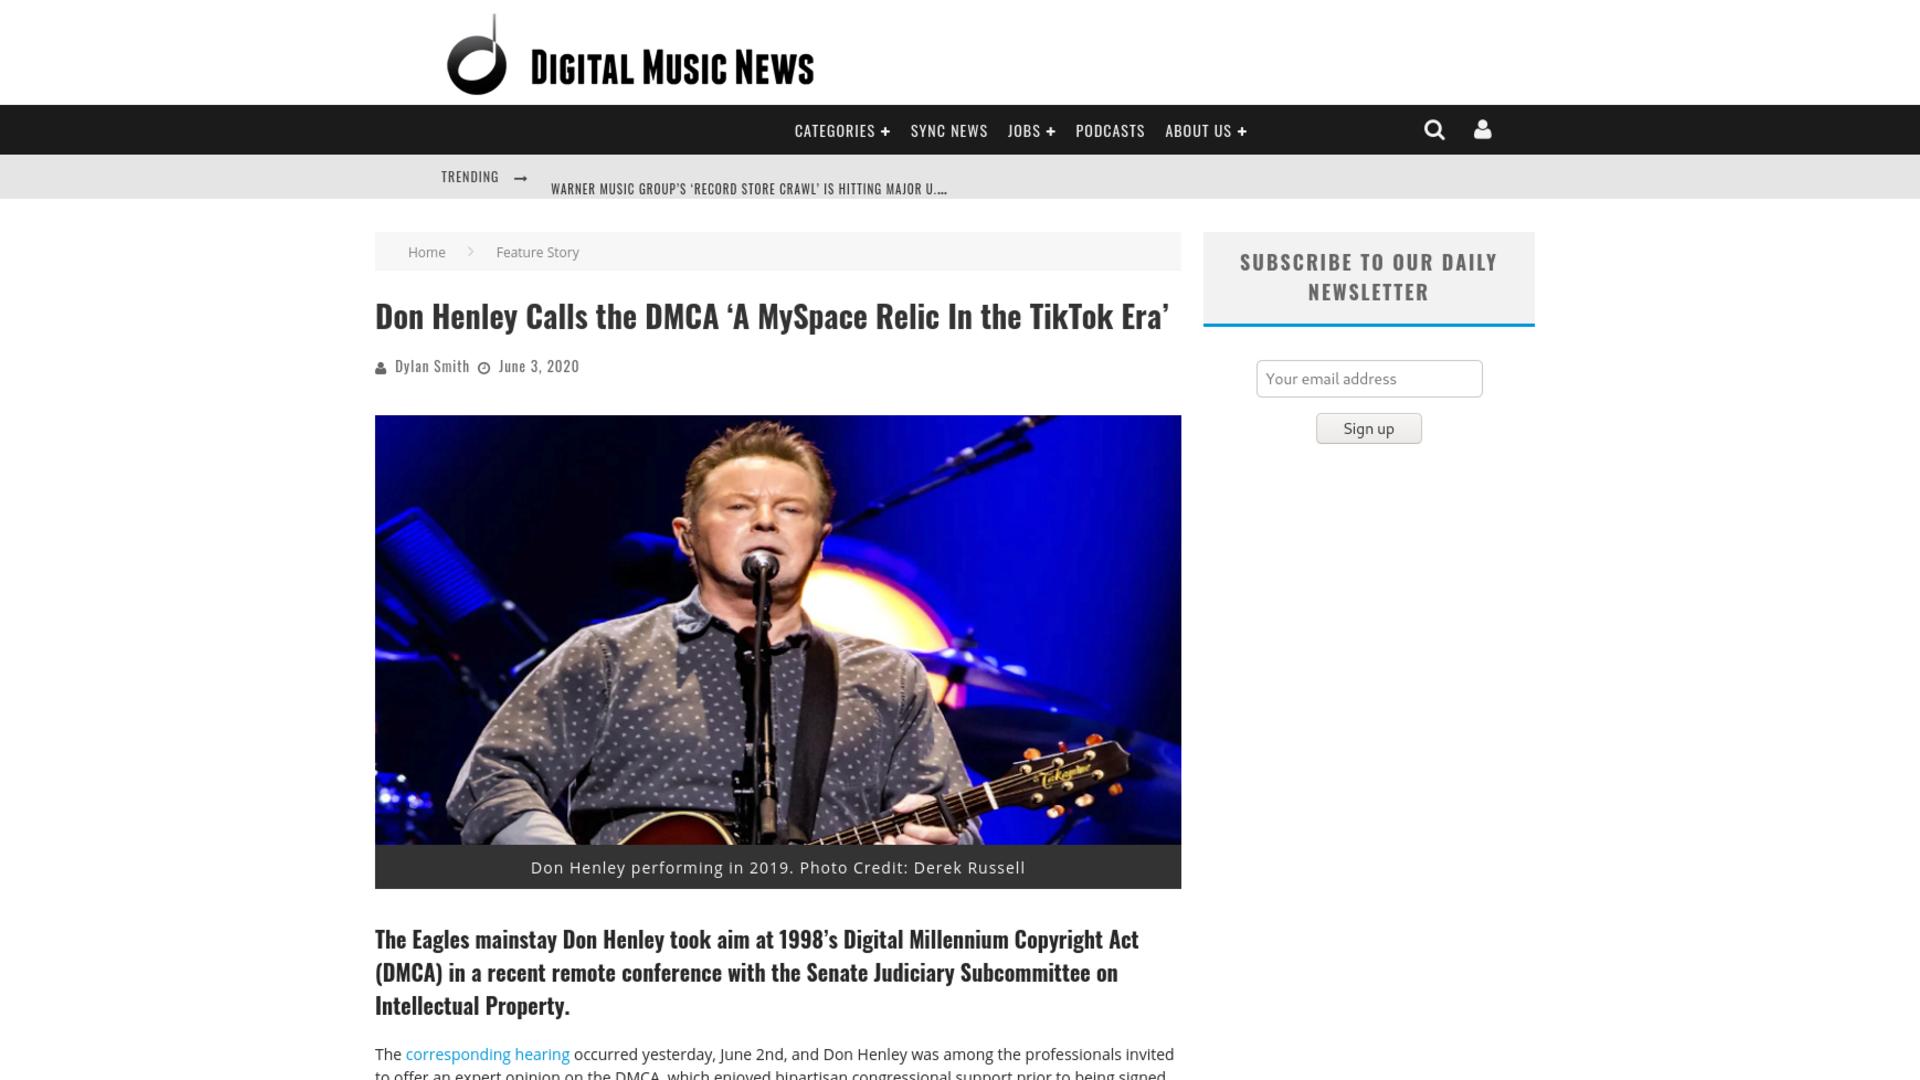 Fairness Rocks News Don Henley Calls the DMCA 'A MySpace Relic In the TikTok Era'